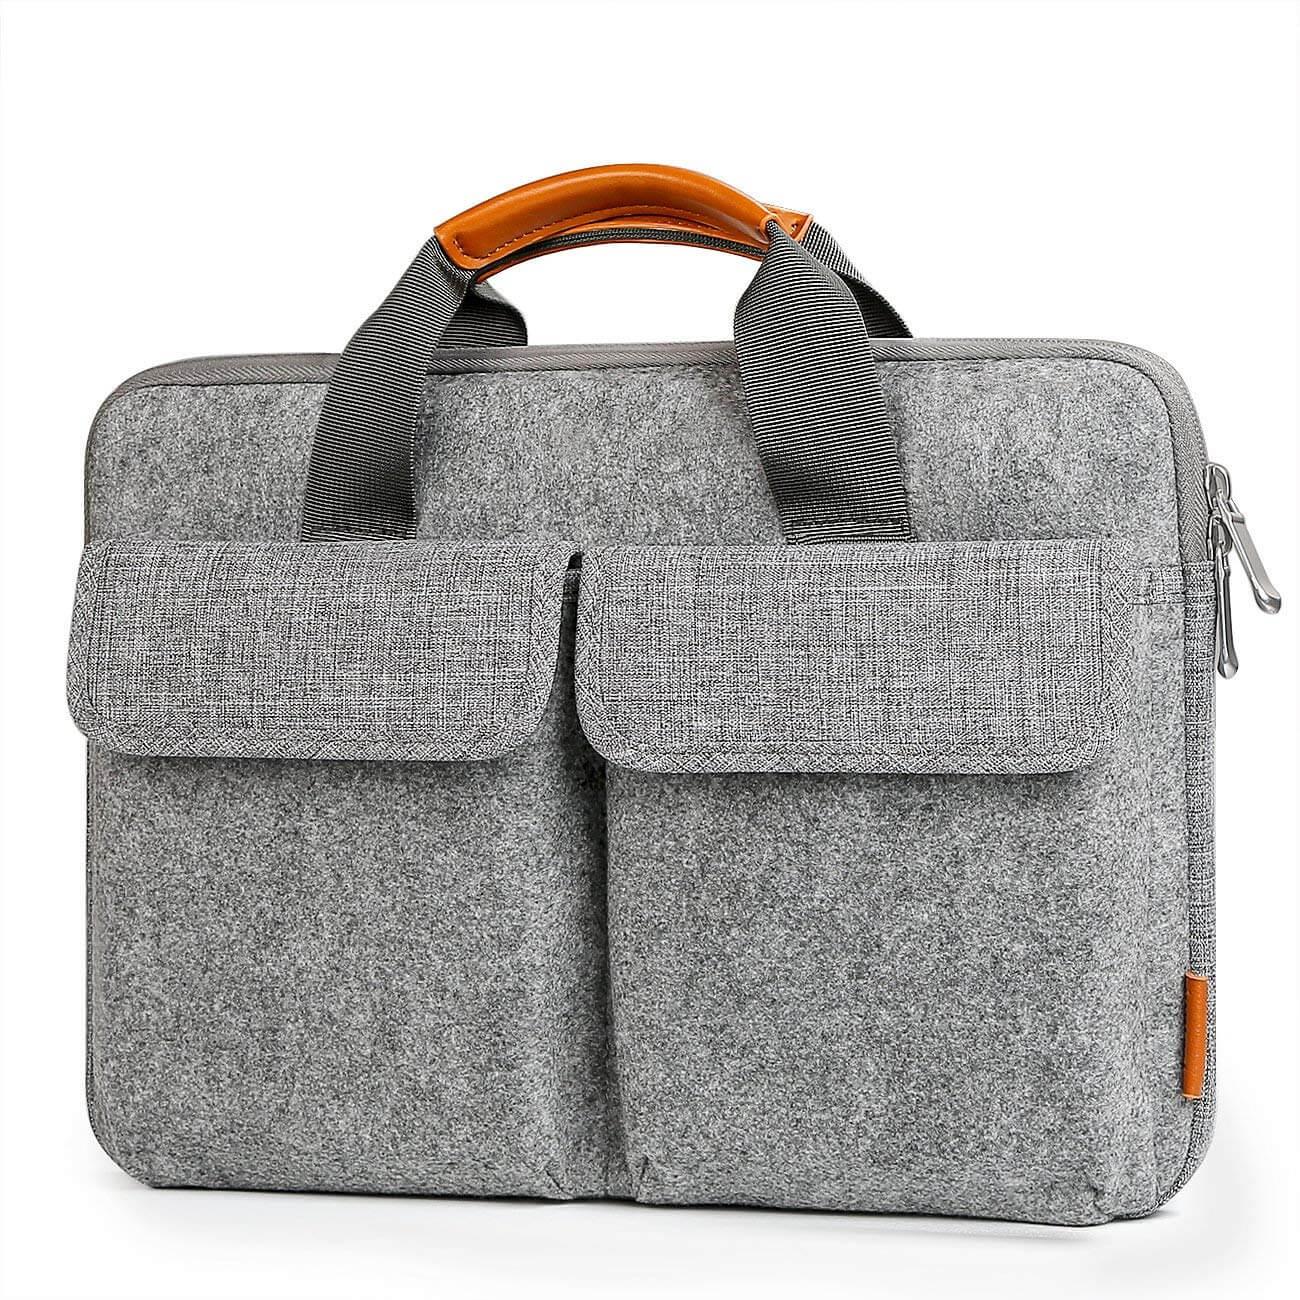 Inateck 13-13.3 Inch Laptop Sleeve Case, Felt Laptop Bag